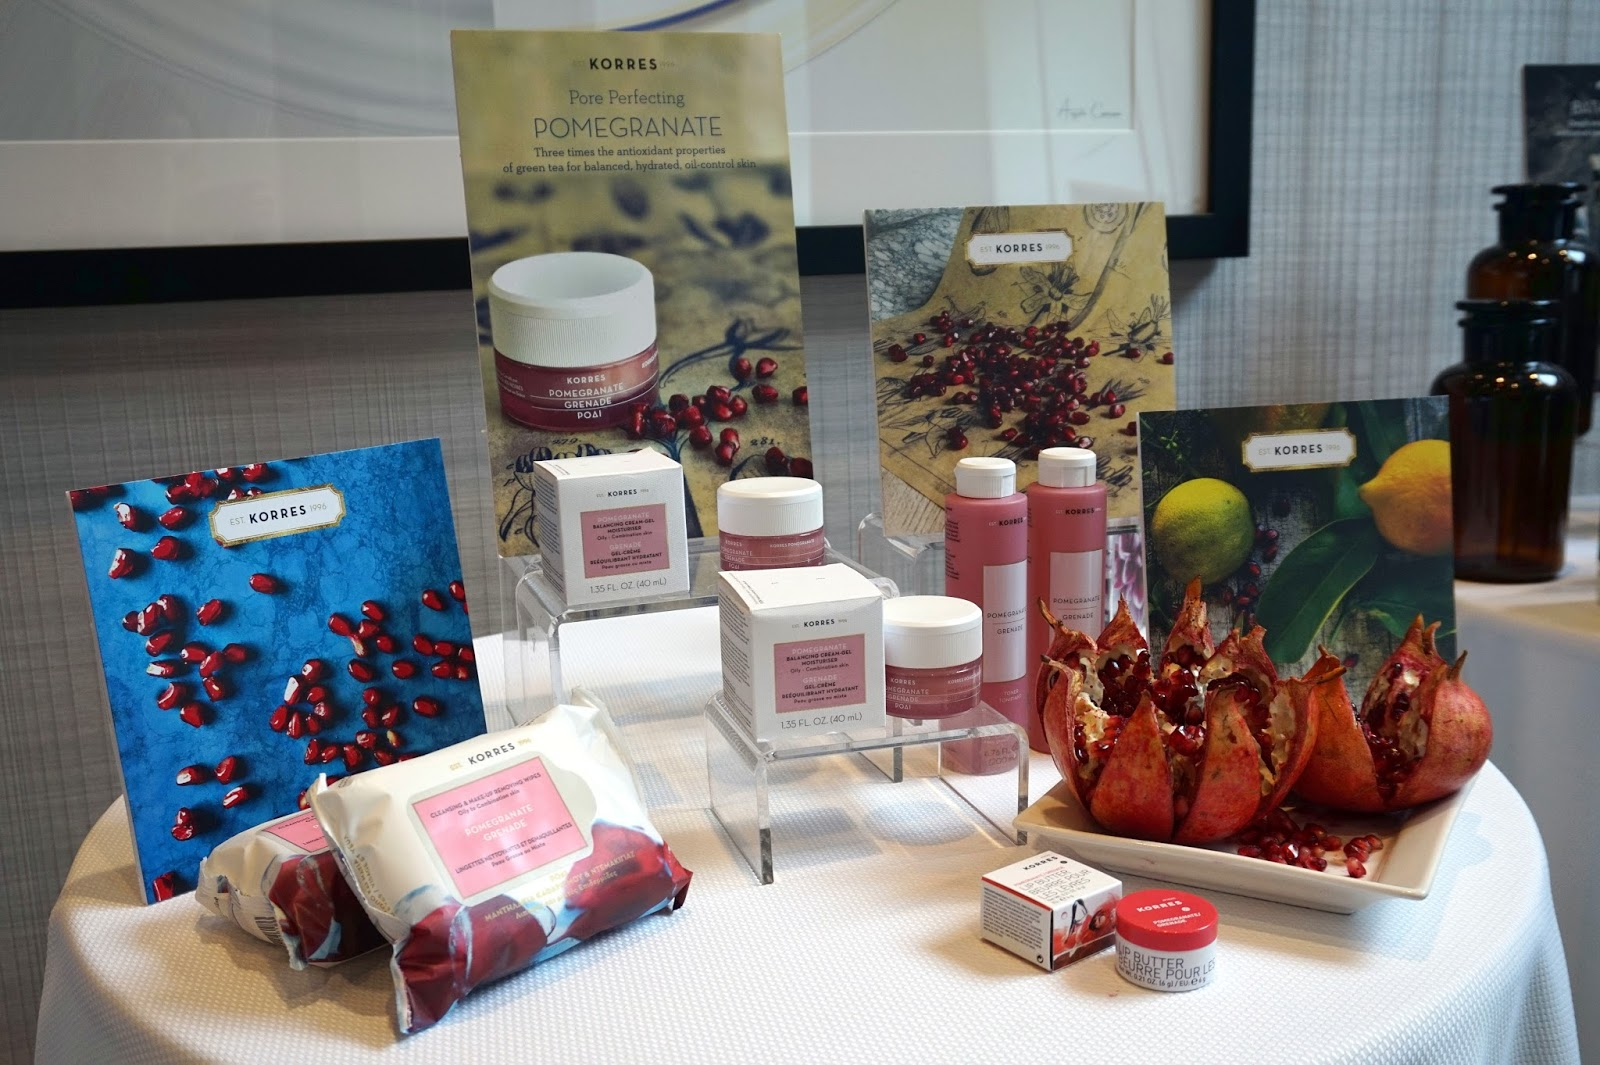 korres skincare pomegranate